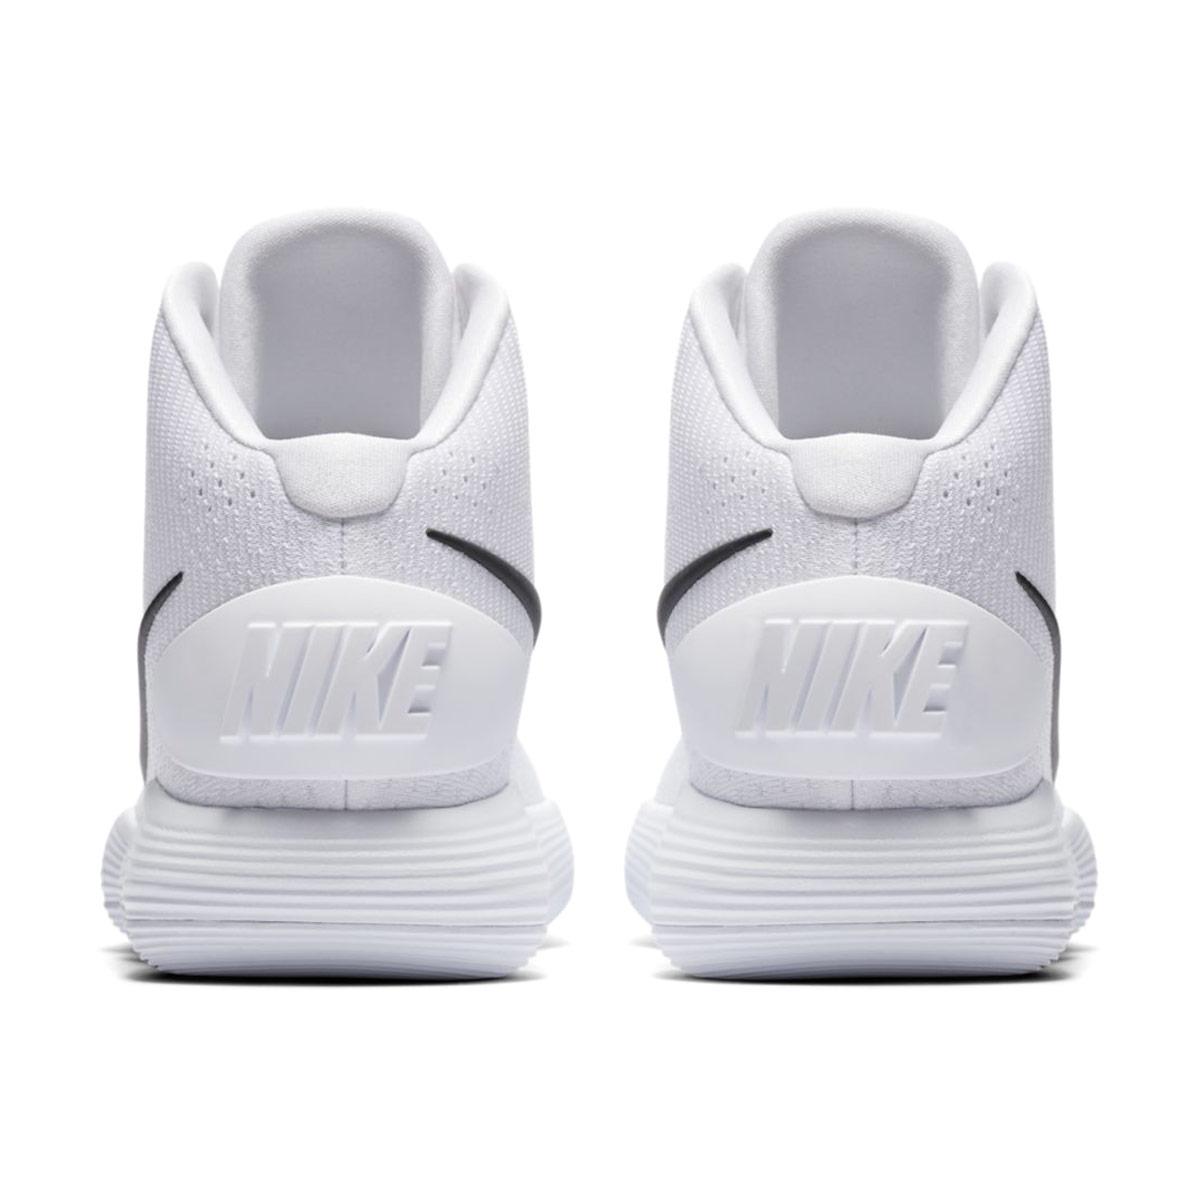 in stock 4fcee abe84 NIKE HYPERDUNK 2017 TB (Nike hyper dunk 2017 TB) WHITE BLACK 17FA-I